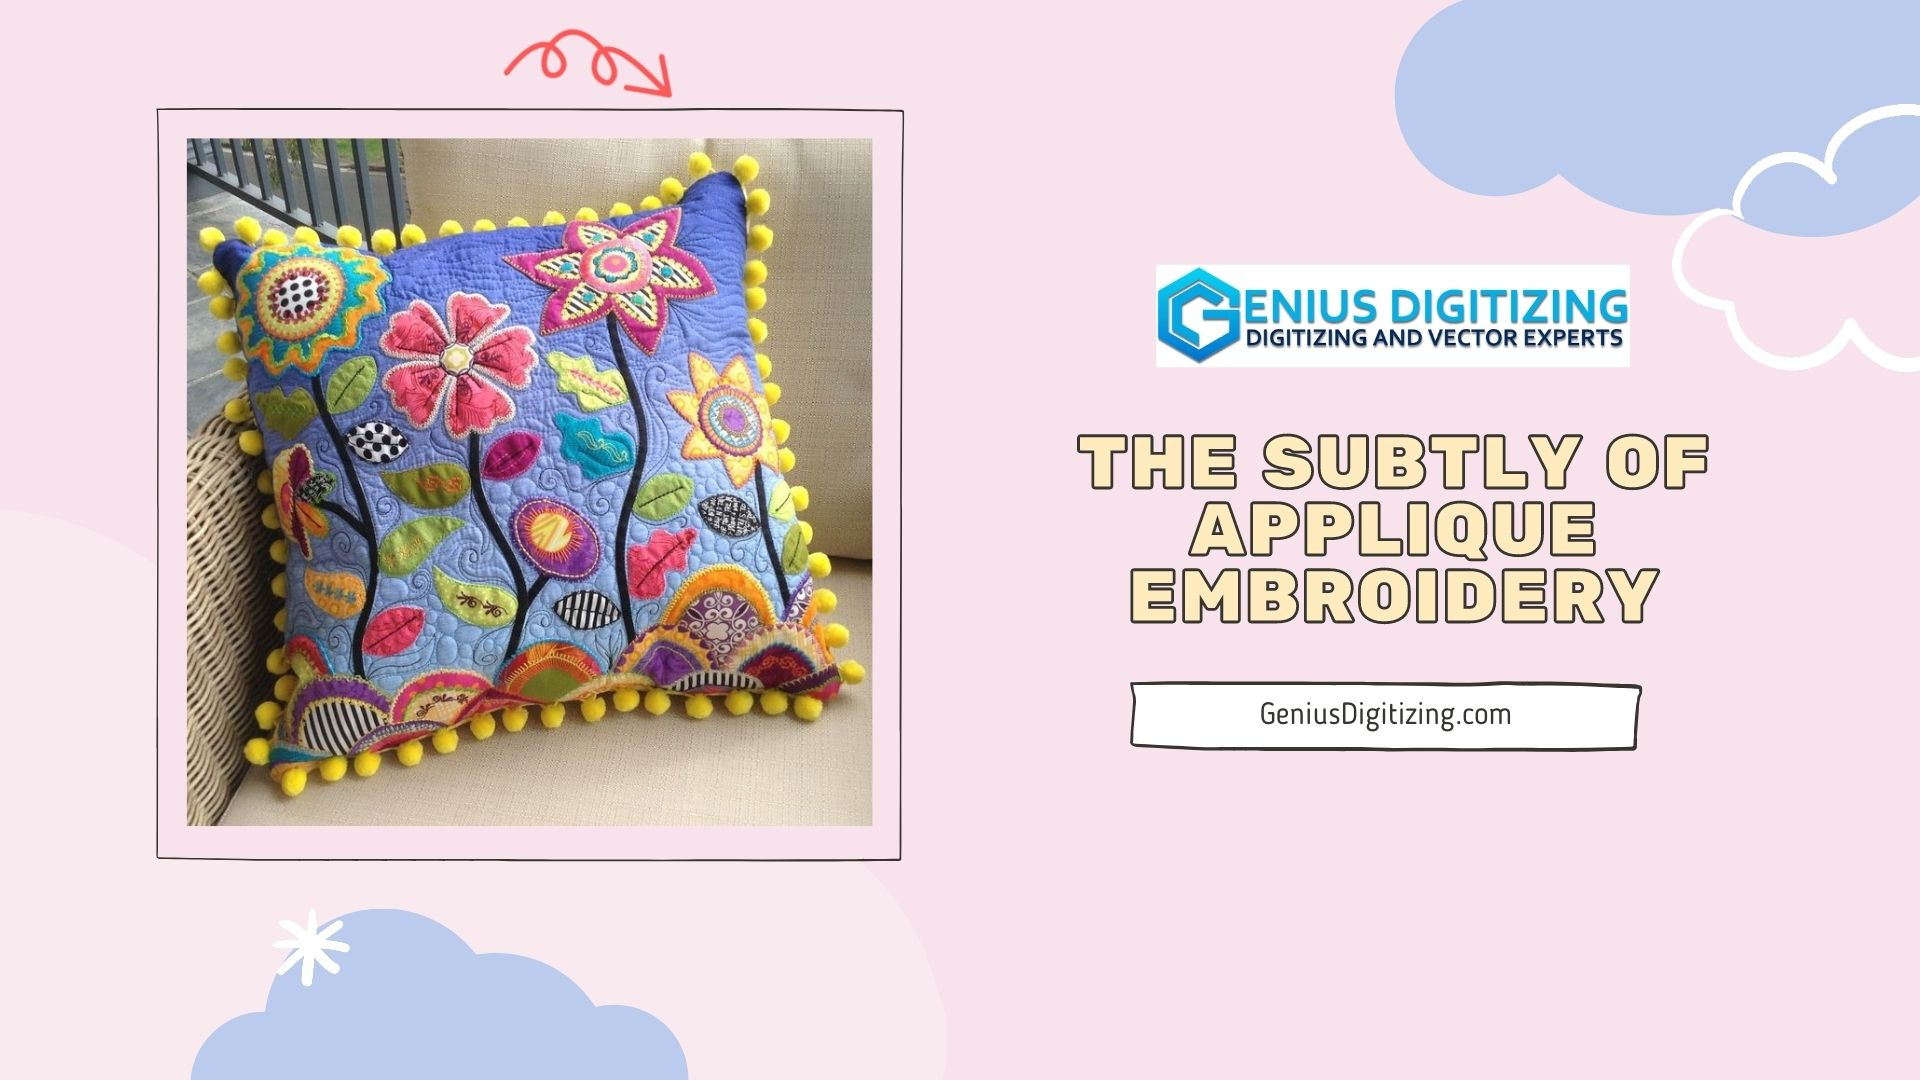 <div> <p> The Subtly of Applique Embroidery</p> </div> <p> </p>